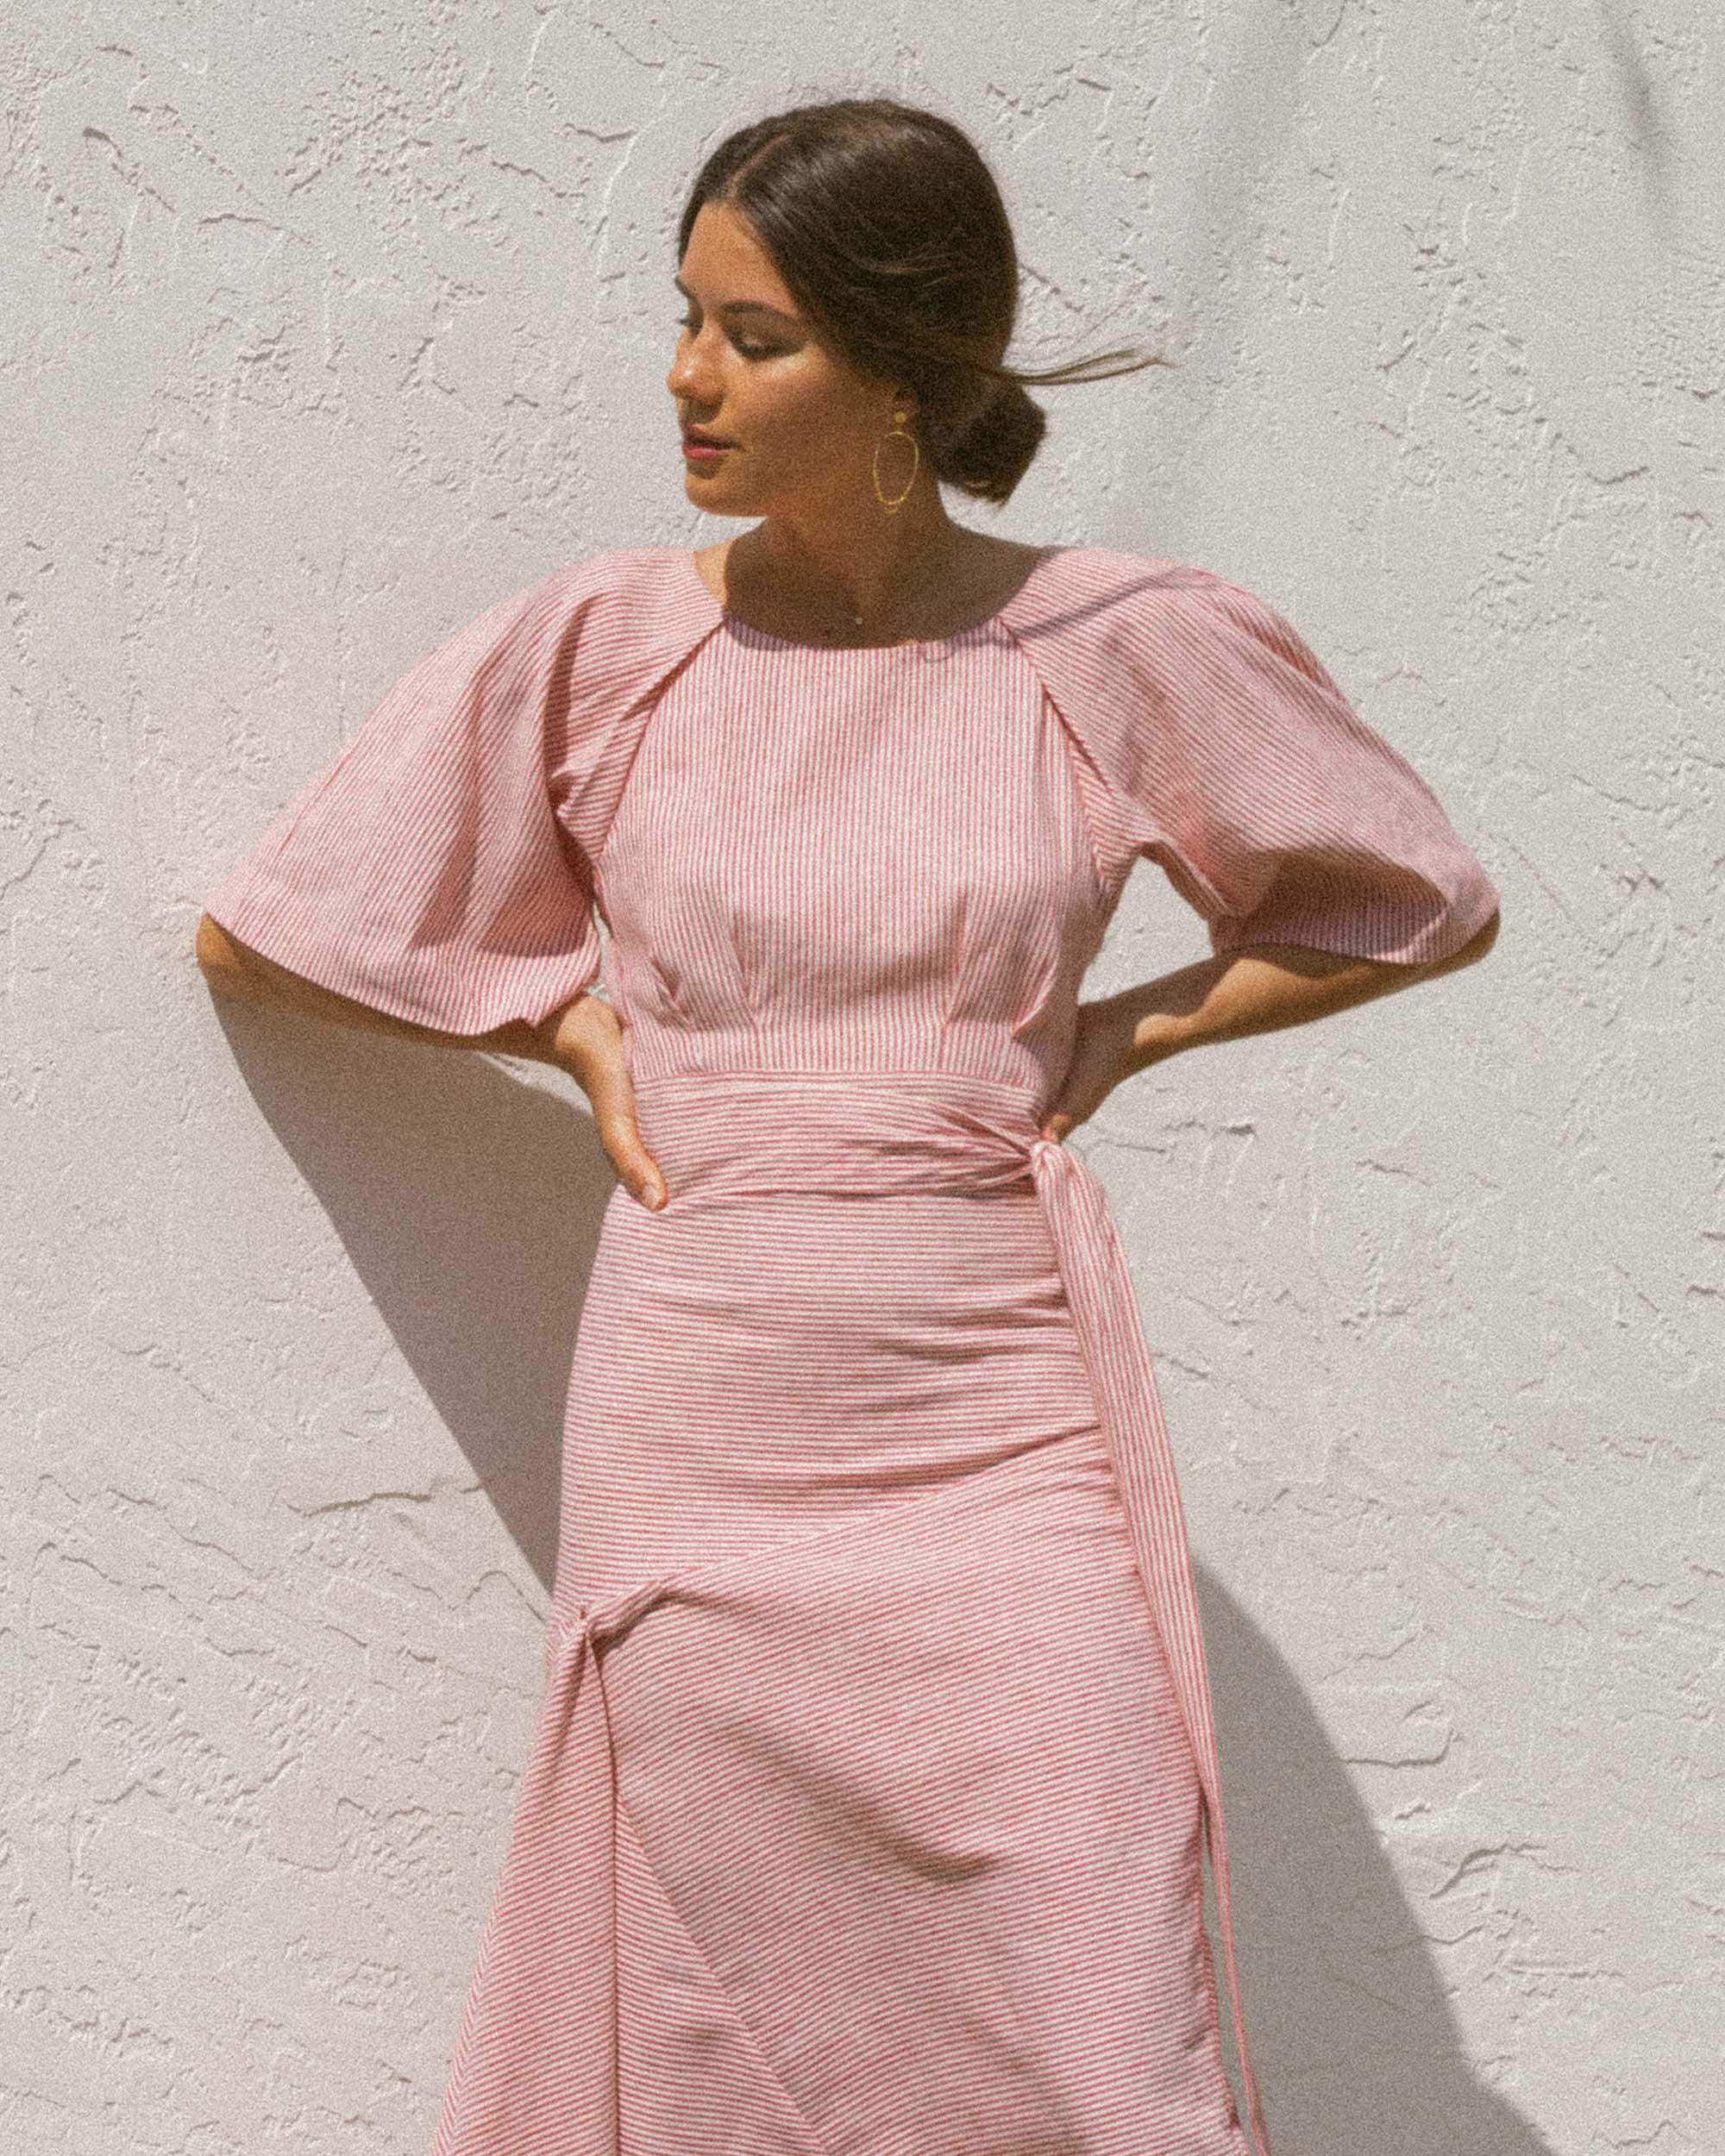 Sarah Butler of Sarah Styles wears BcbgMaxAzria Pinstripe Asymmetric Skirt and Pinstripe Cutout Back Cropped Top in Seattle   @sarahchristine -3.jpg